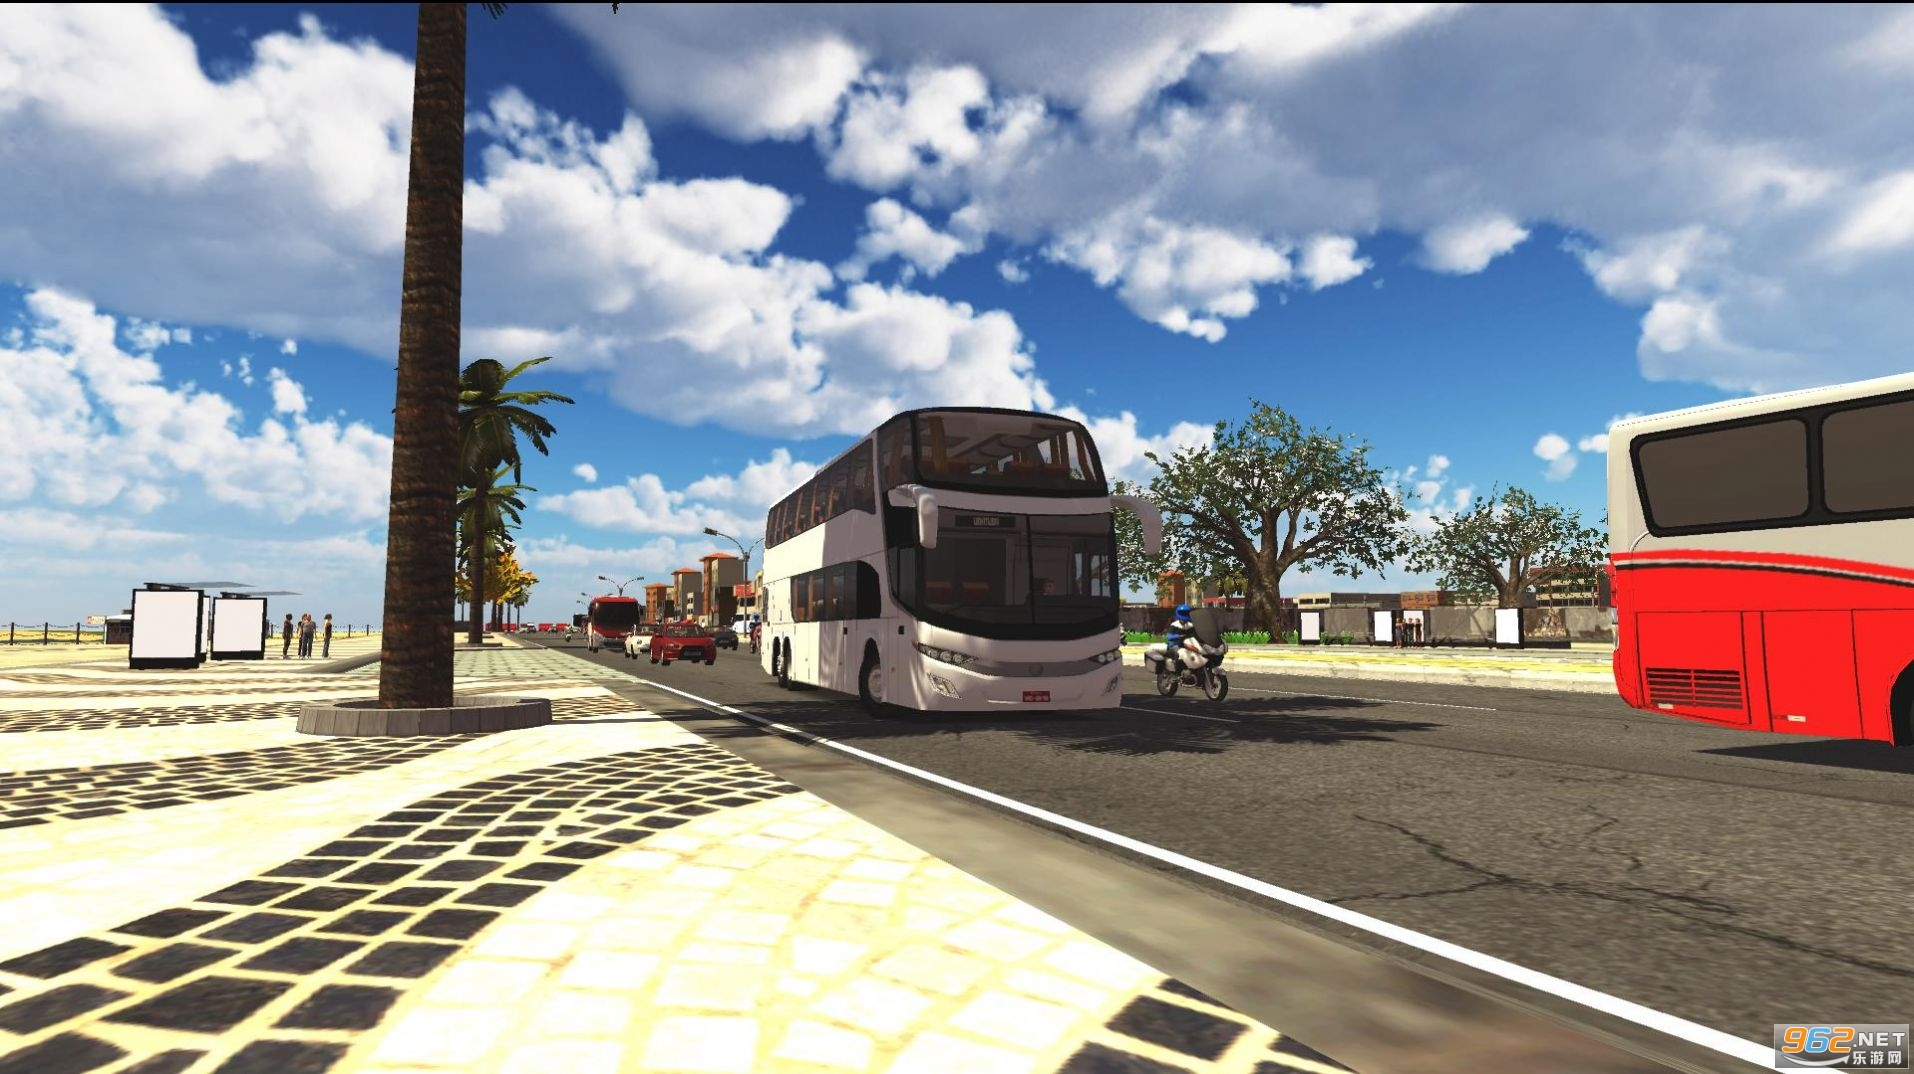 pbsr驾驶模拟器游戏v169 破解版截图2